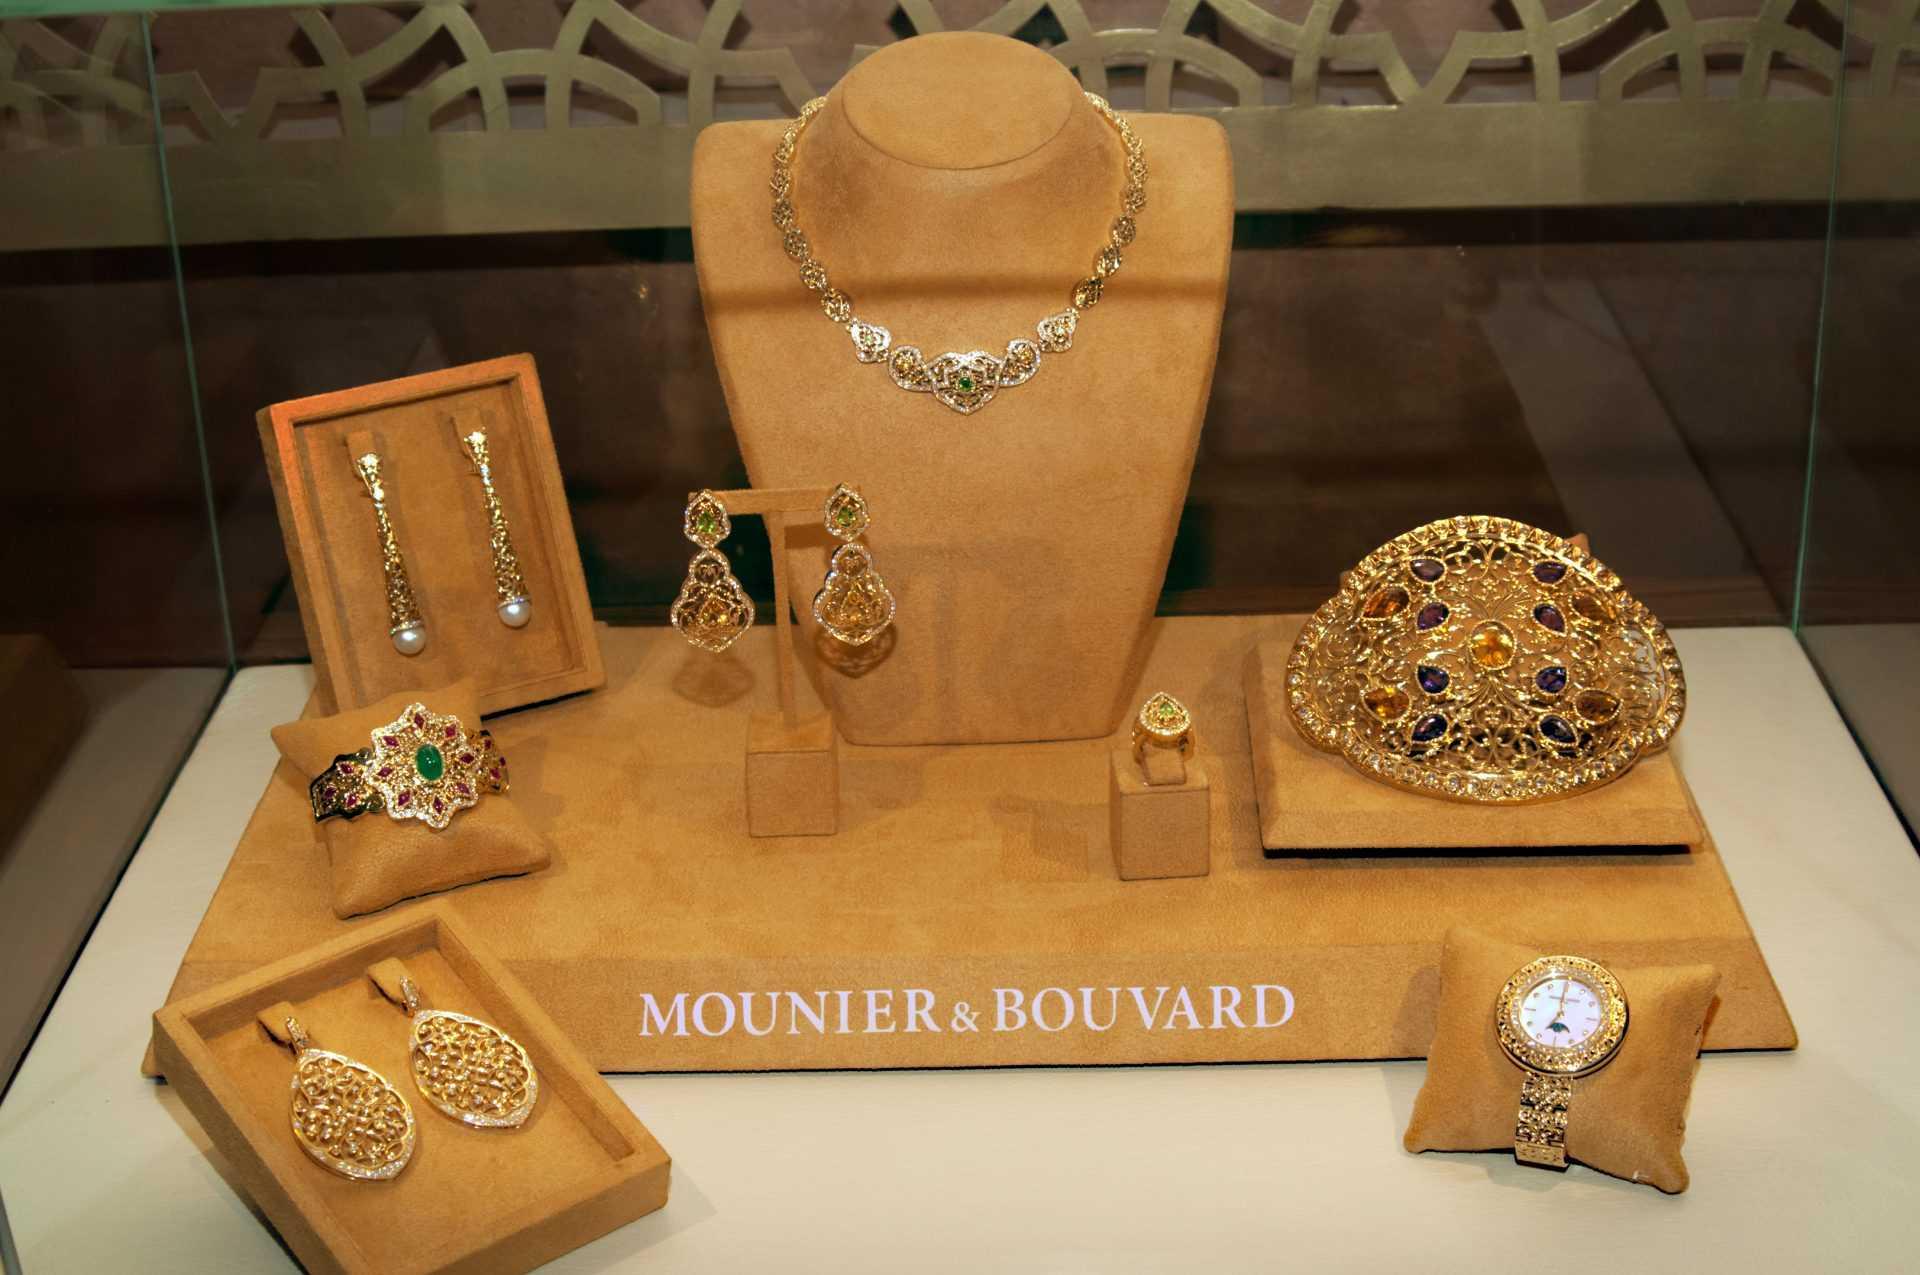 Des bijoux ultra glamour signés Mounier & Bouvard